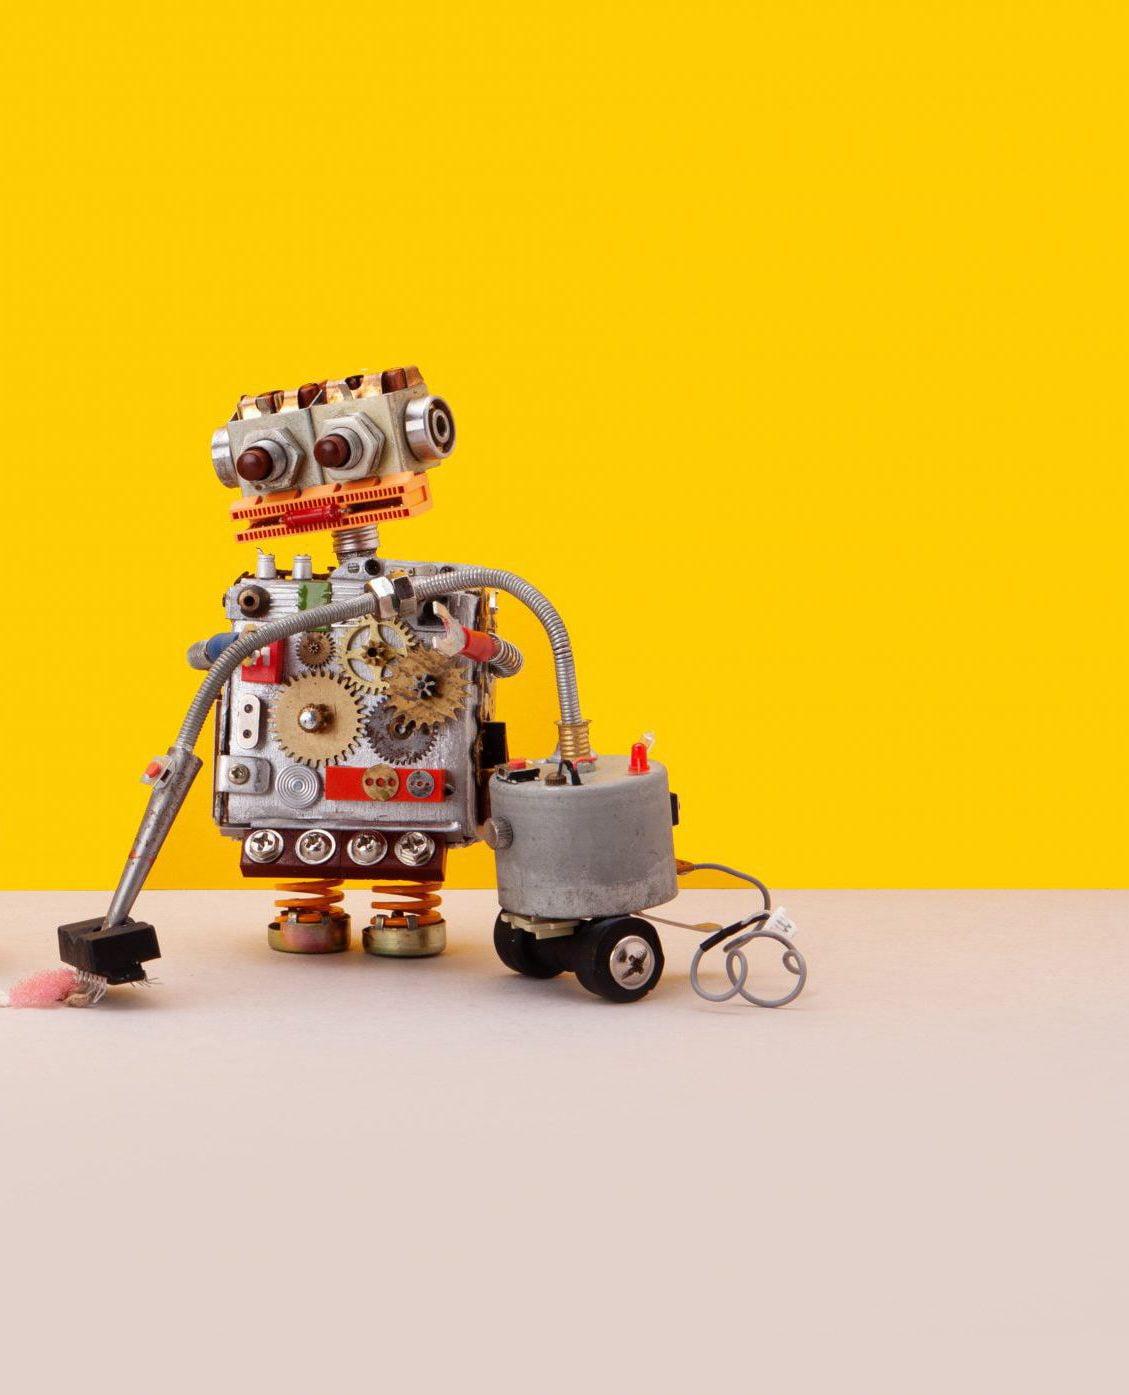 Robot na żółtym tle